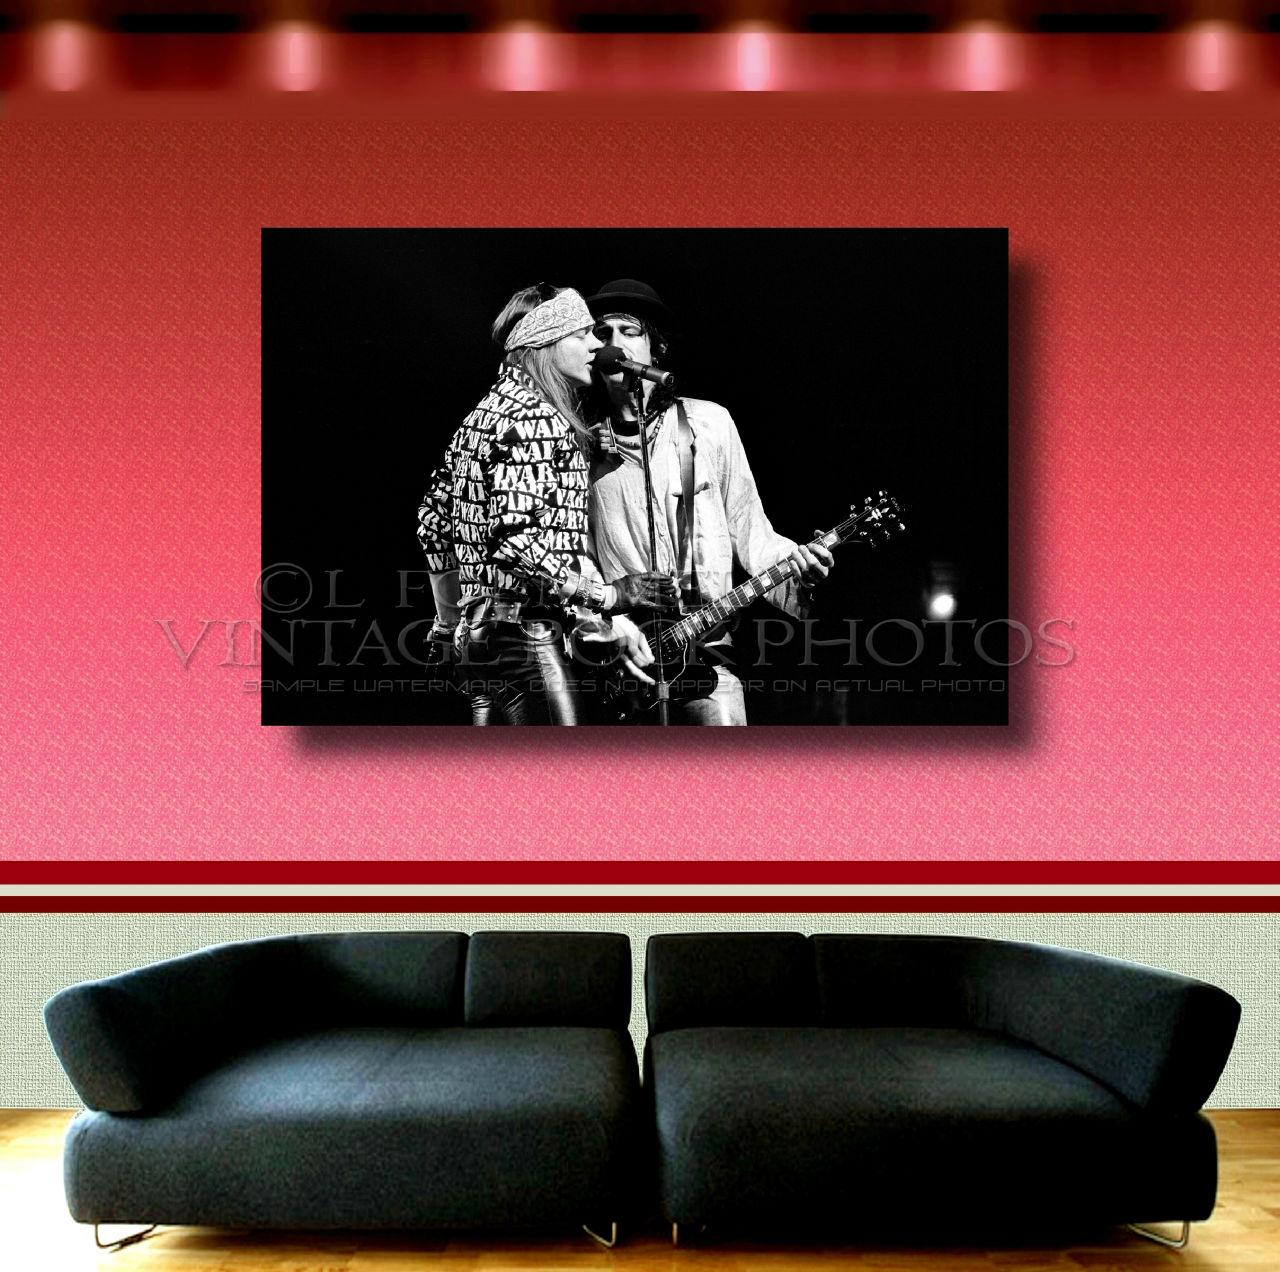 Axl Rose, Izzy Stradlin GNR 24x36 Inch Poster Size Photo